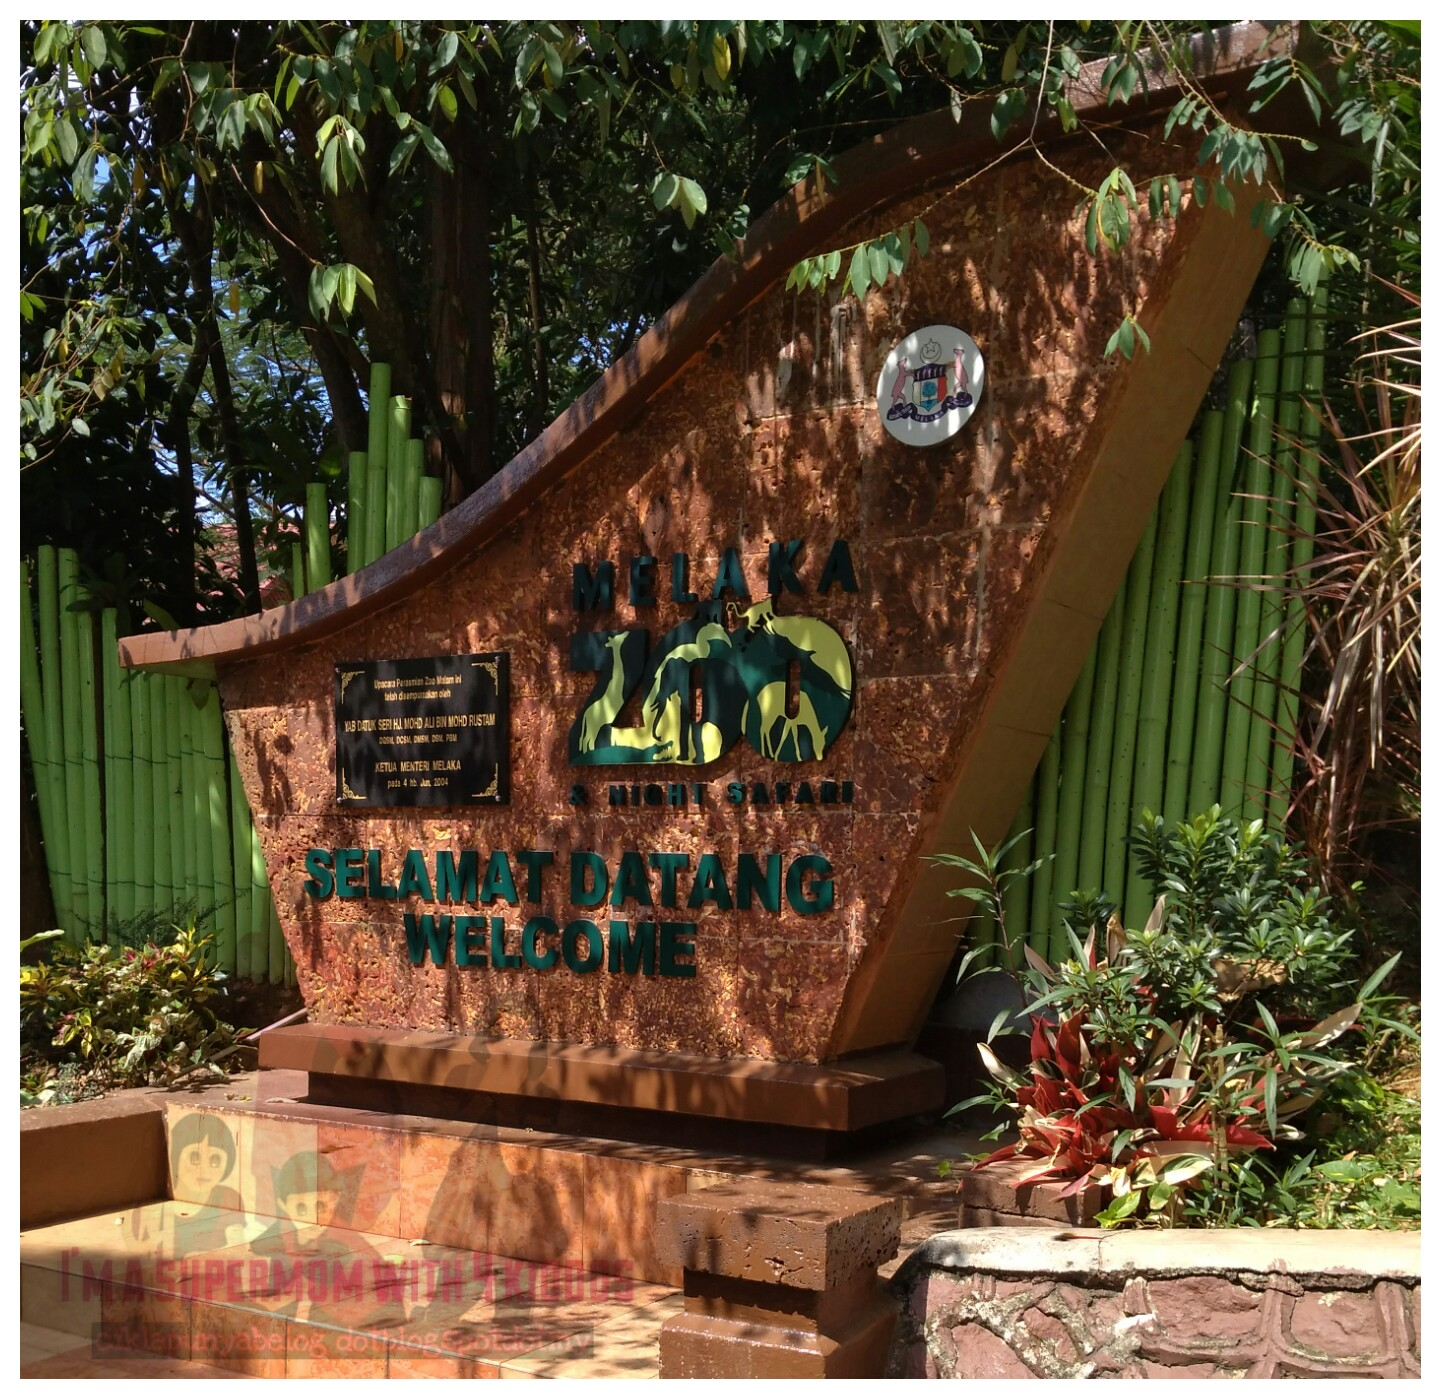 [Entri Bergambar] Jalan-jalan melihat flora dan fauna di Zoo Melaka.